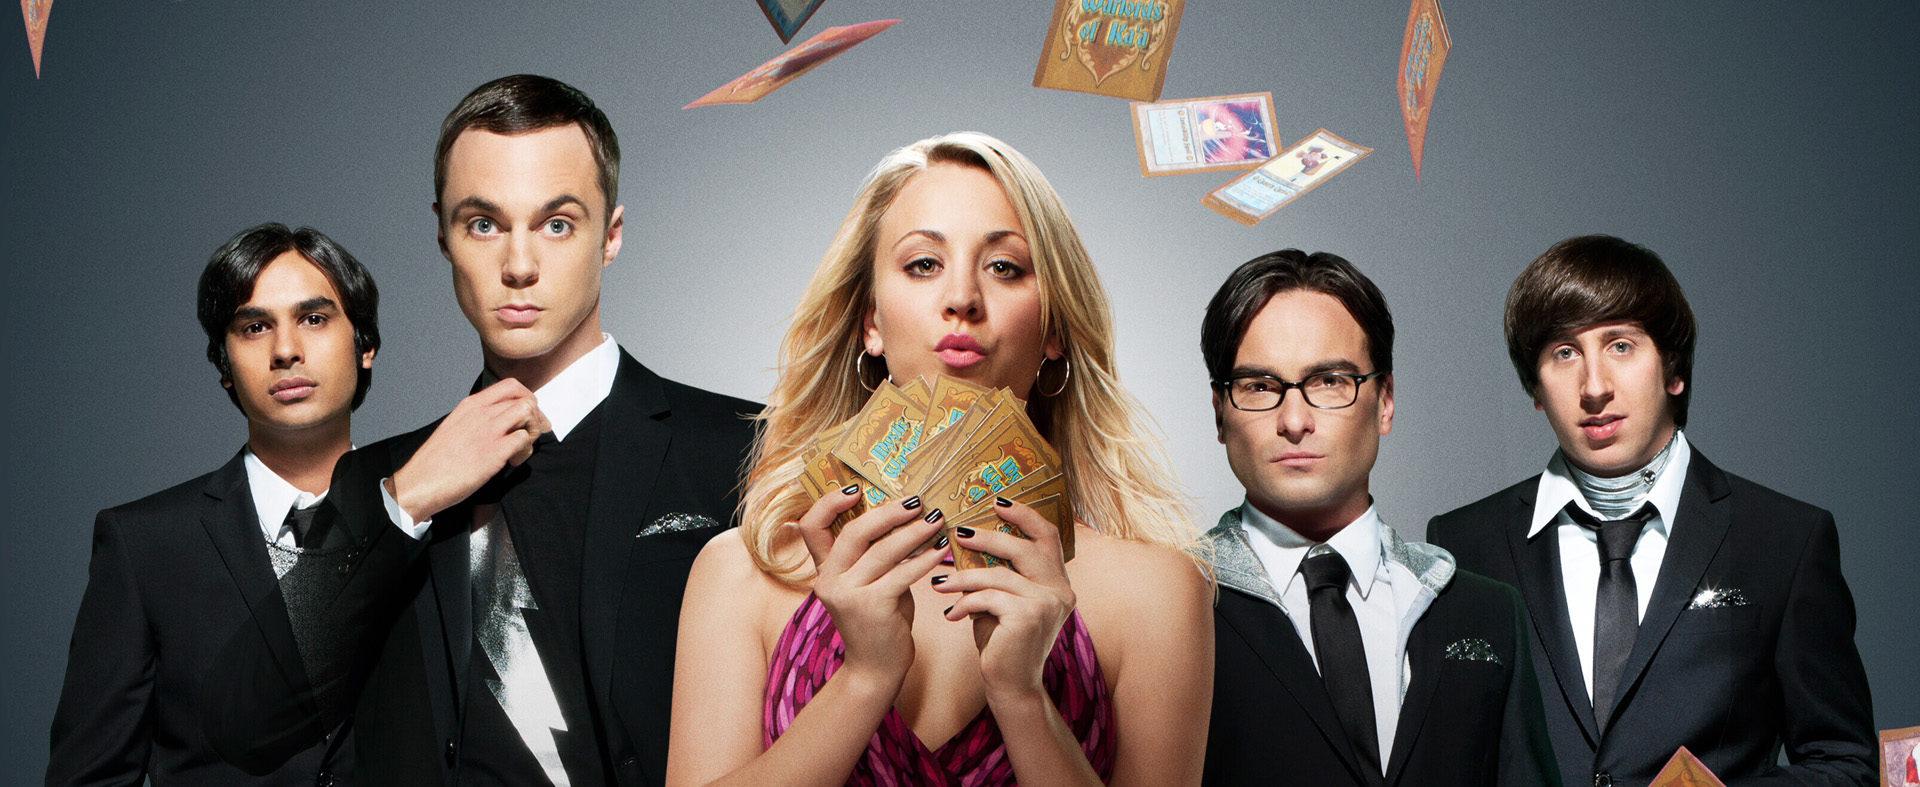 Saiba como foi a estreia do último ano de The Big Bang Theory